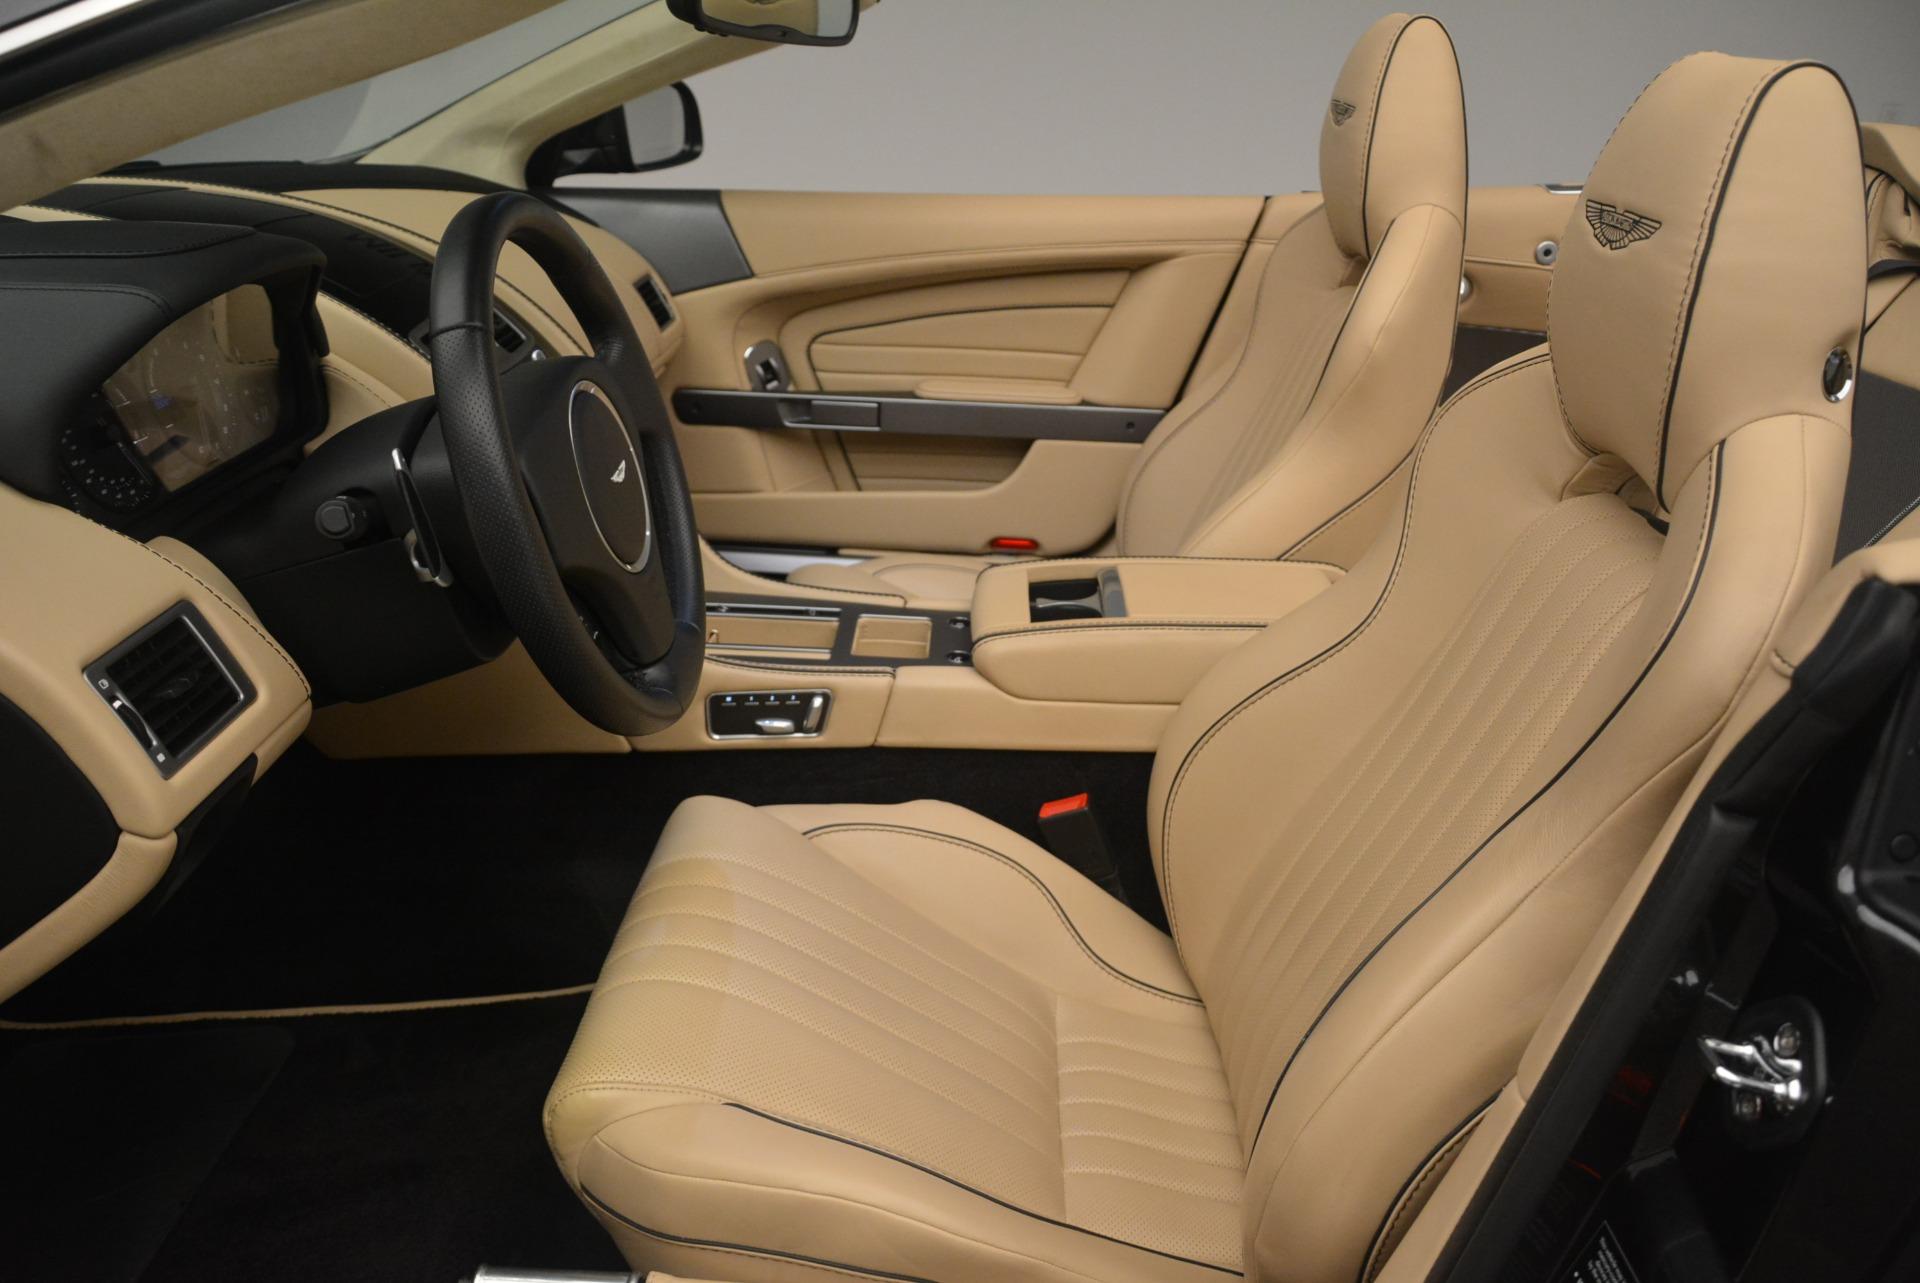 Used 2016 Aston Martin DB9 GT Volante For Sale In Greenwich, CT 2429_p24